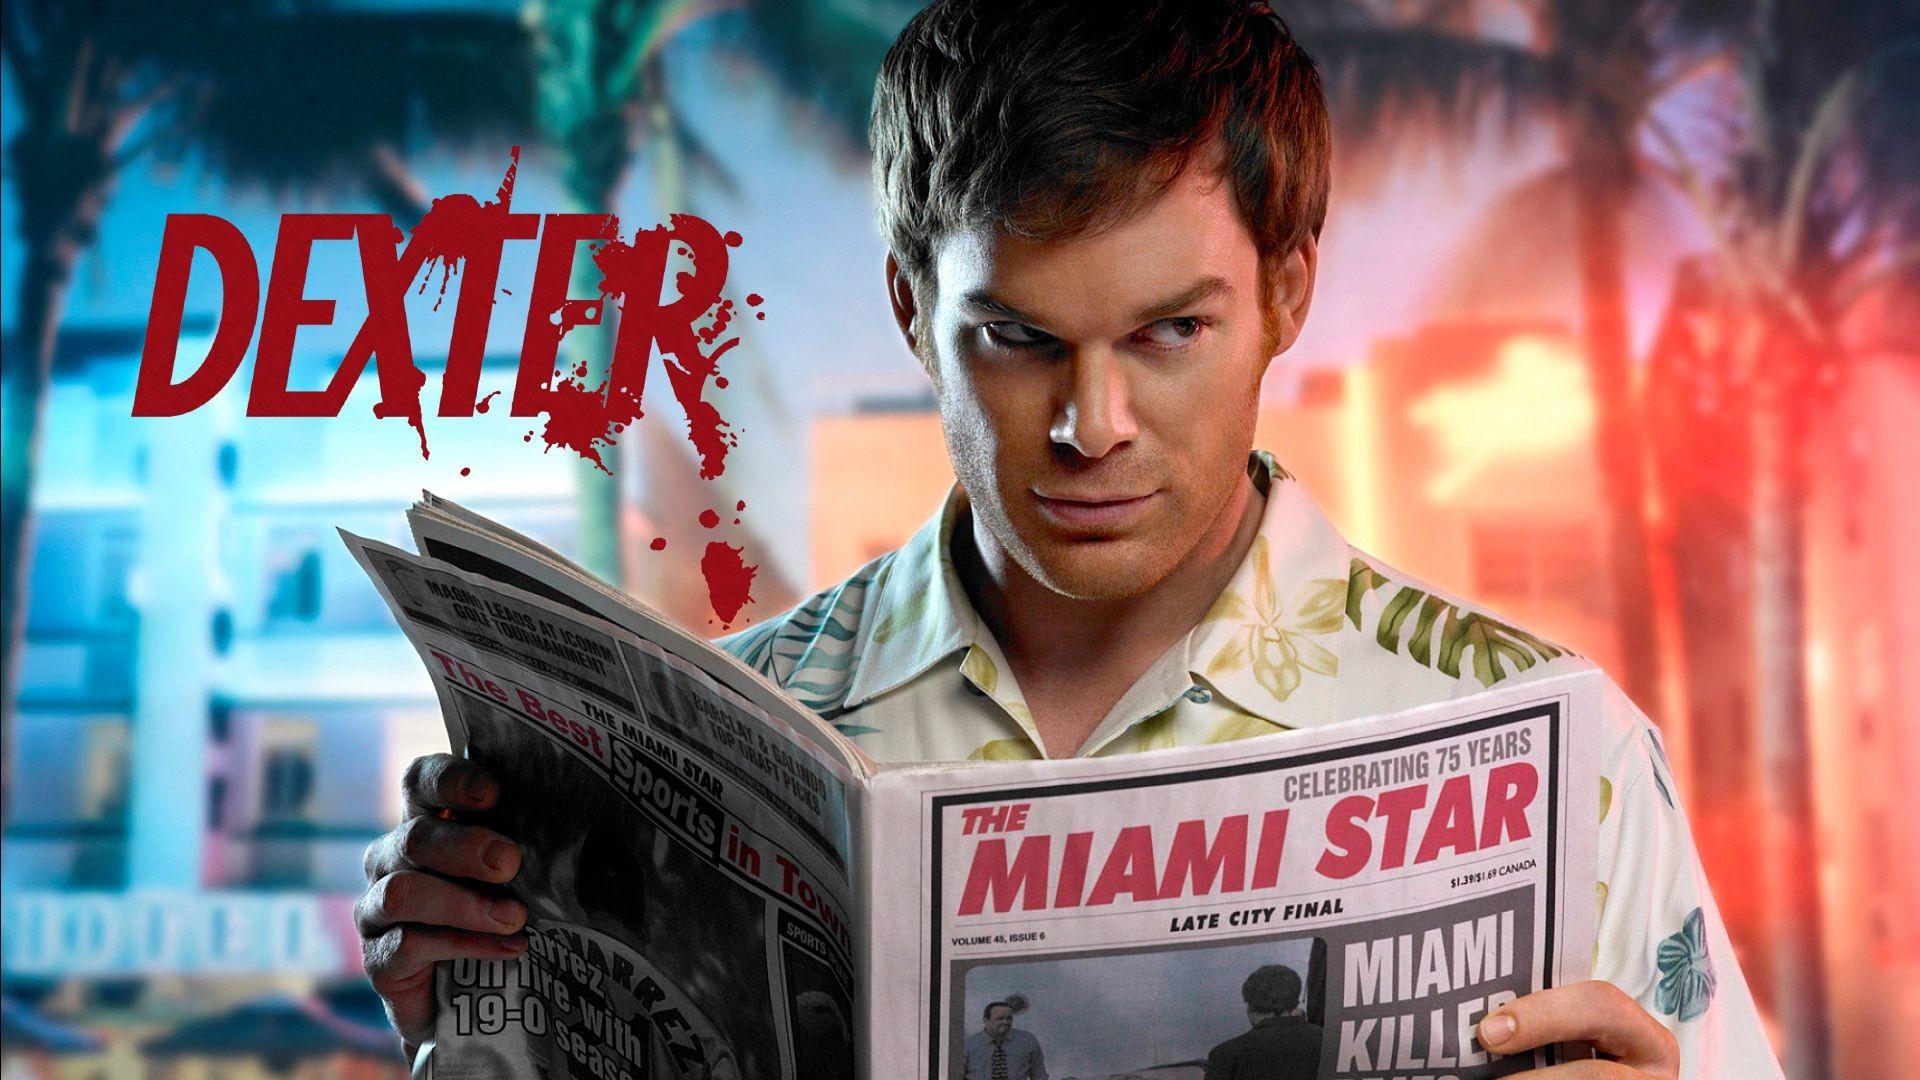 Movies: Dexter, desktop wallpaper nr. 58325 by elrincondelnabo .